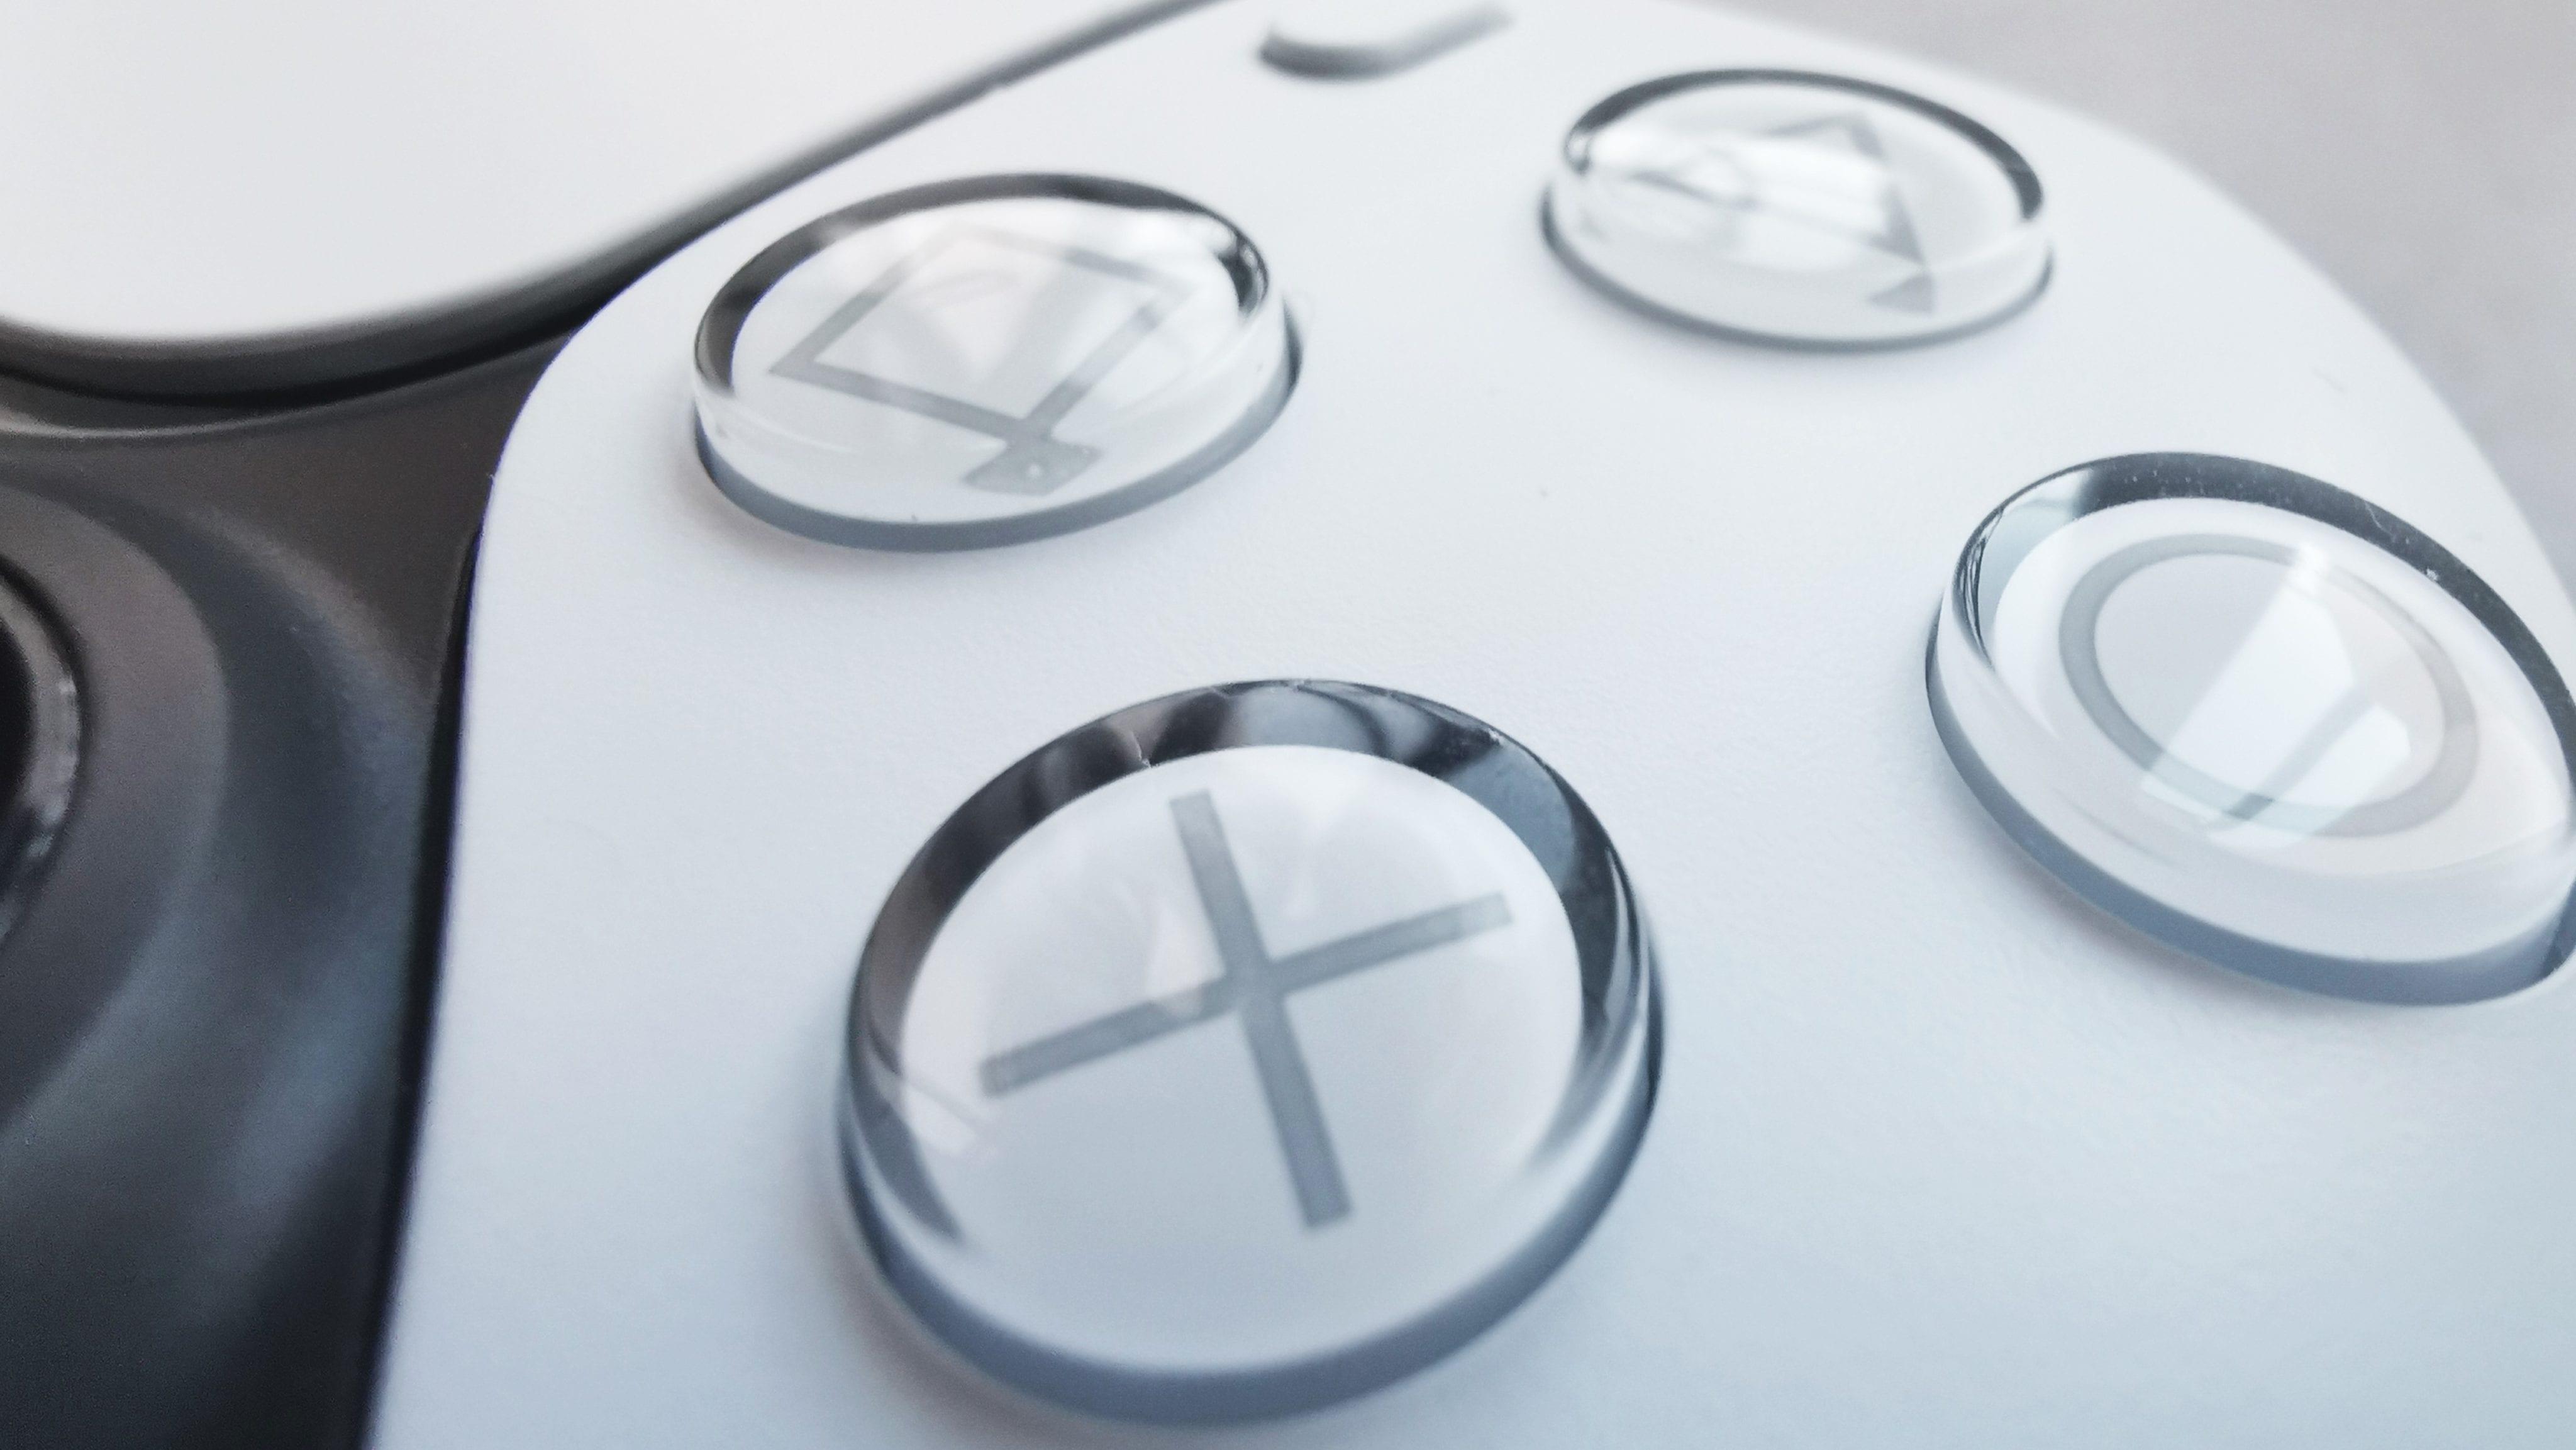 PS5 Details Buttons